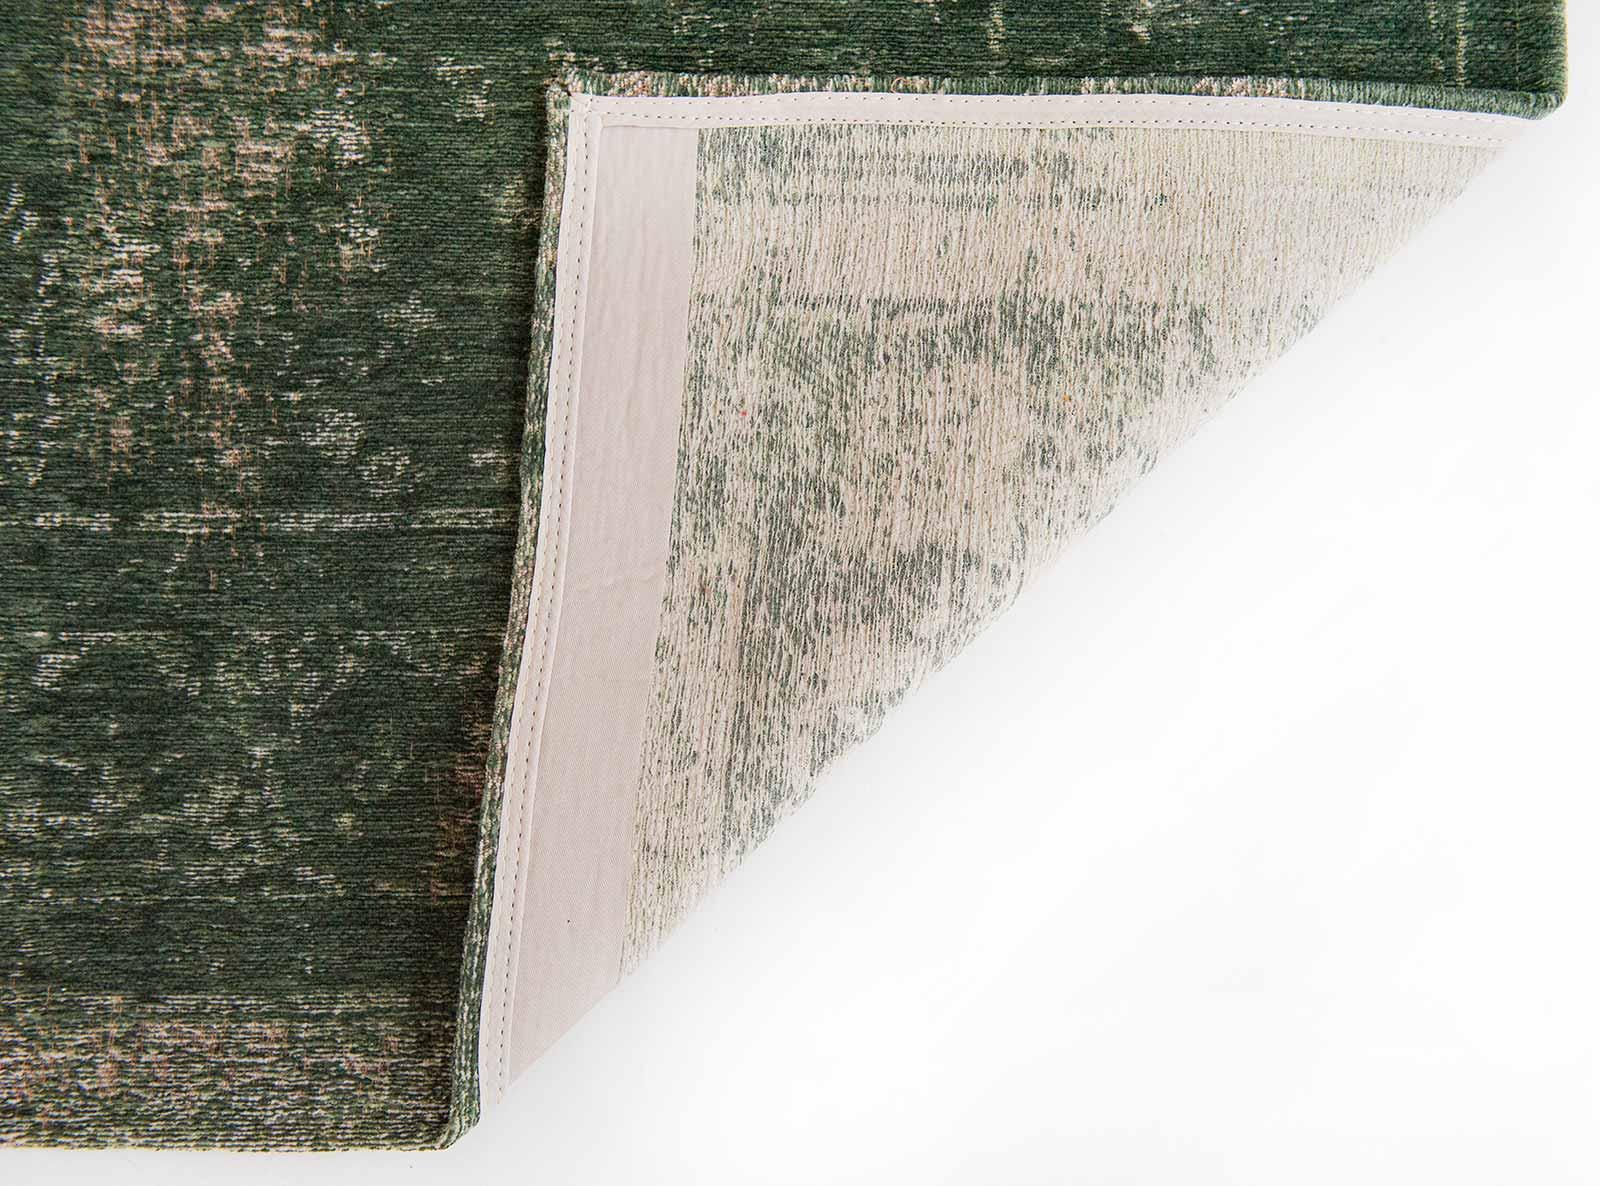 Louis De Poortere rug LX 9146 Fading World Majestic Forest back